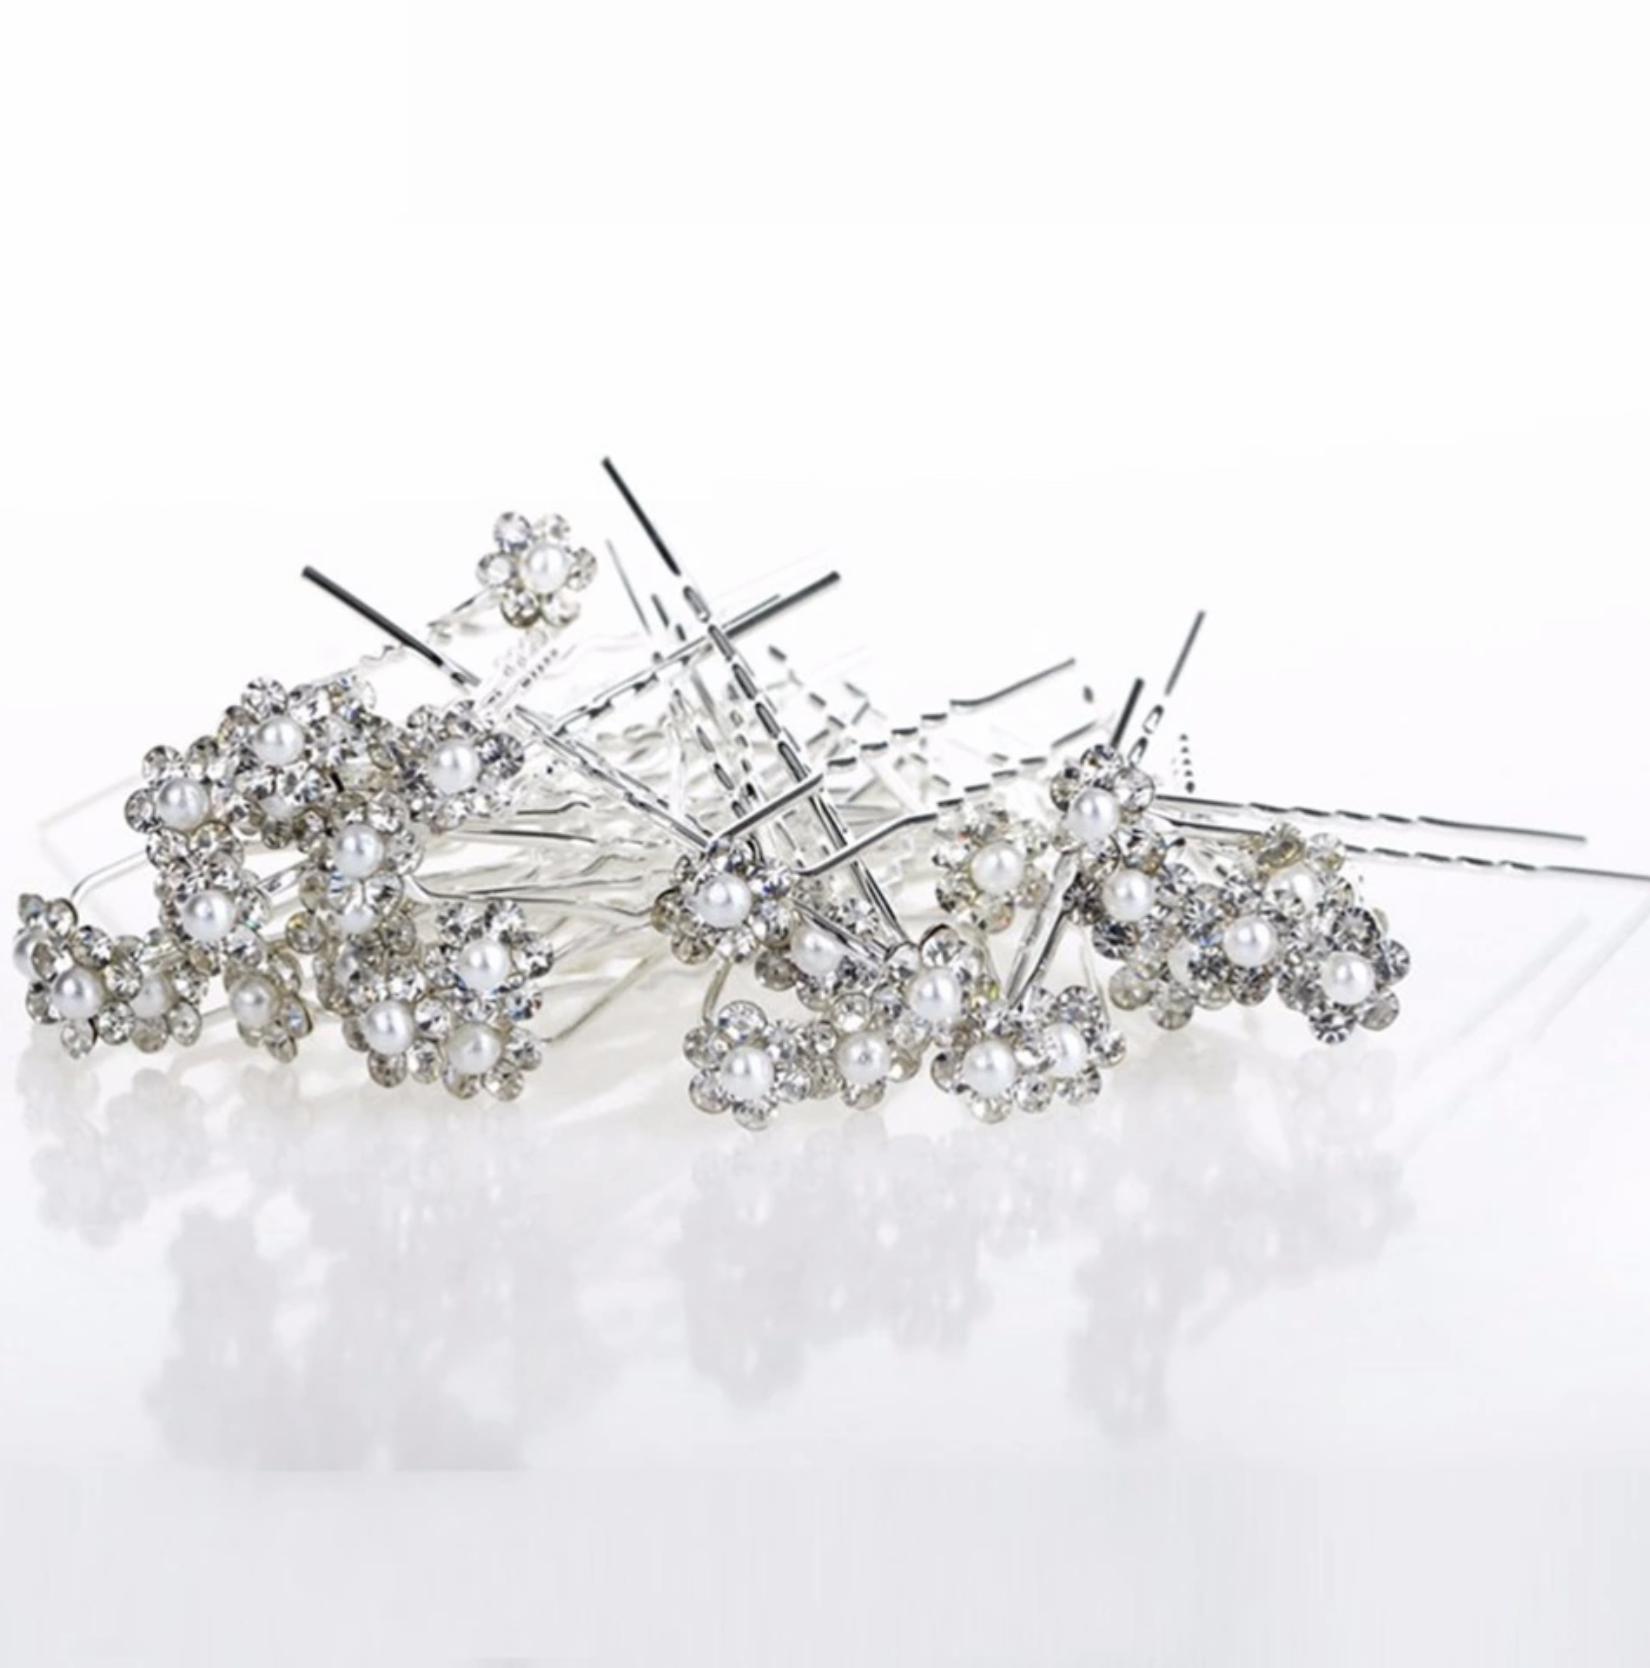 Hairpins 2 pk Blomst & hvid perle